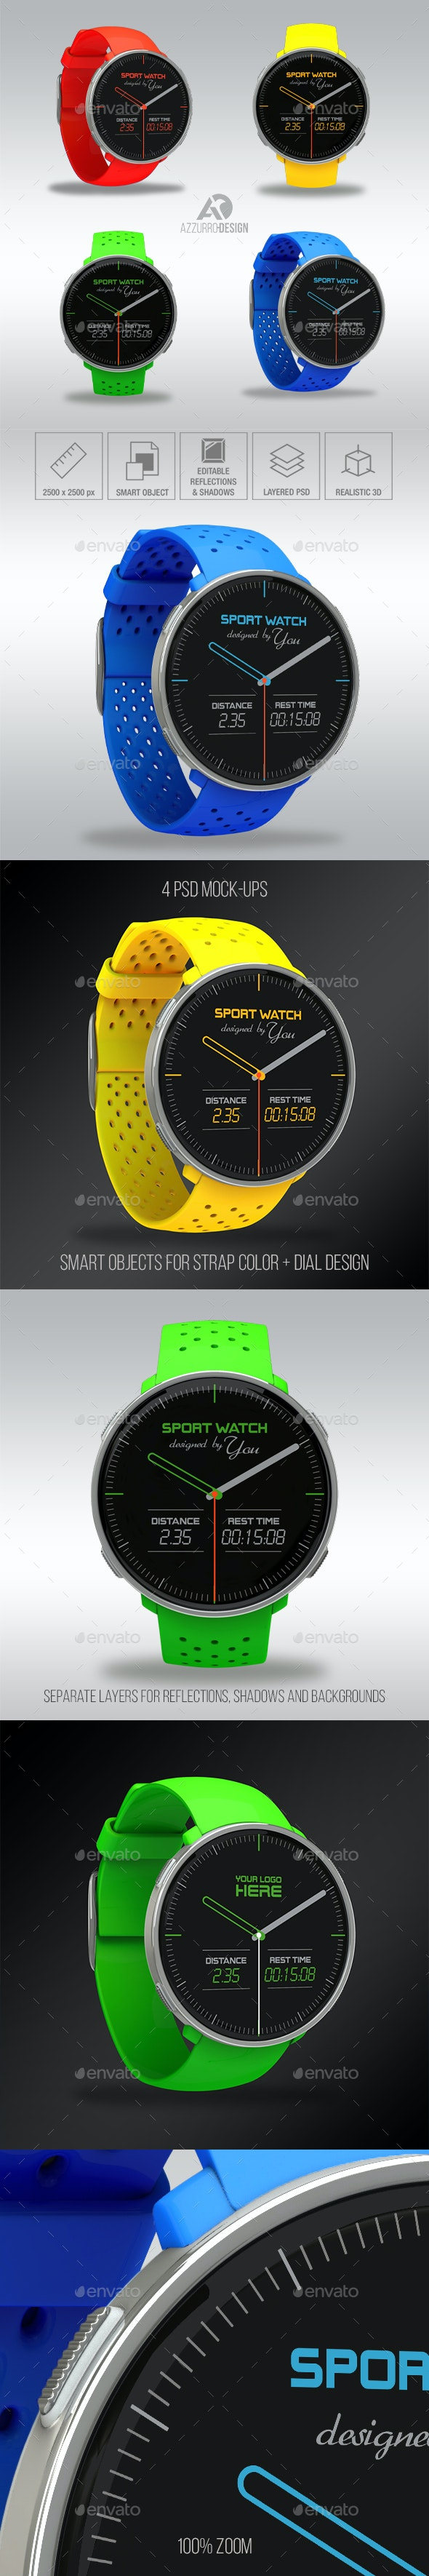 Sport Watch Mockup - Mobile Displays